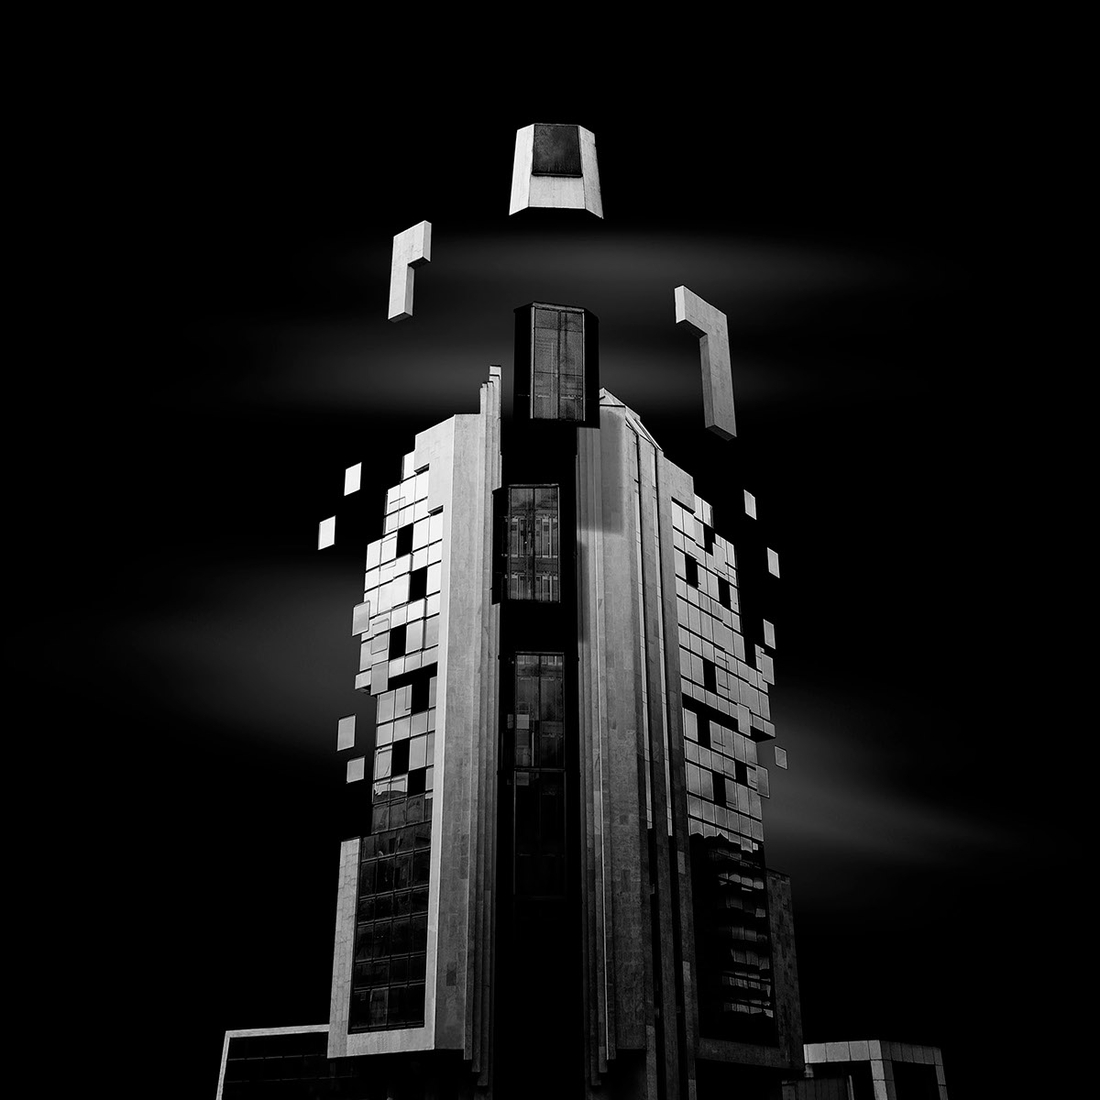 07-Daniel-Garay-Arango-Black-and-White-Surreal-Photographs-Architectural-Deconstruction-www-designstack-co